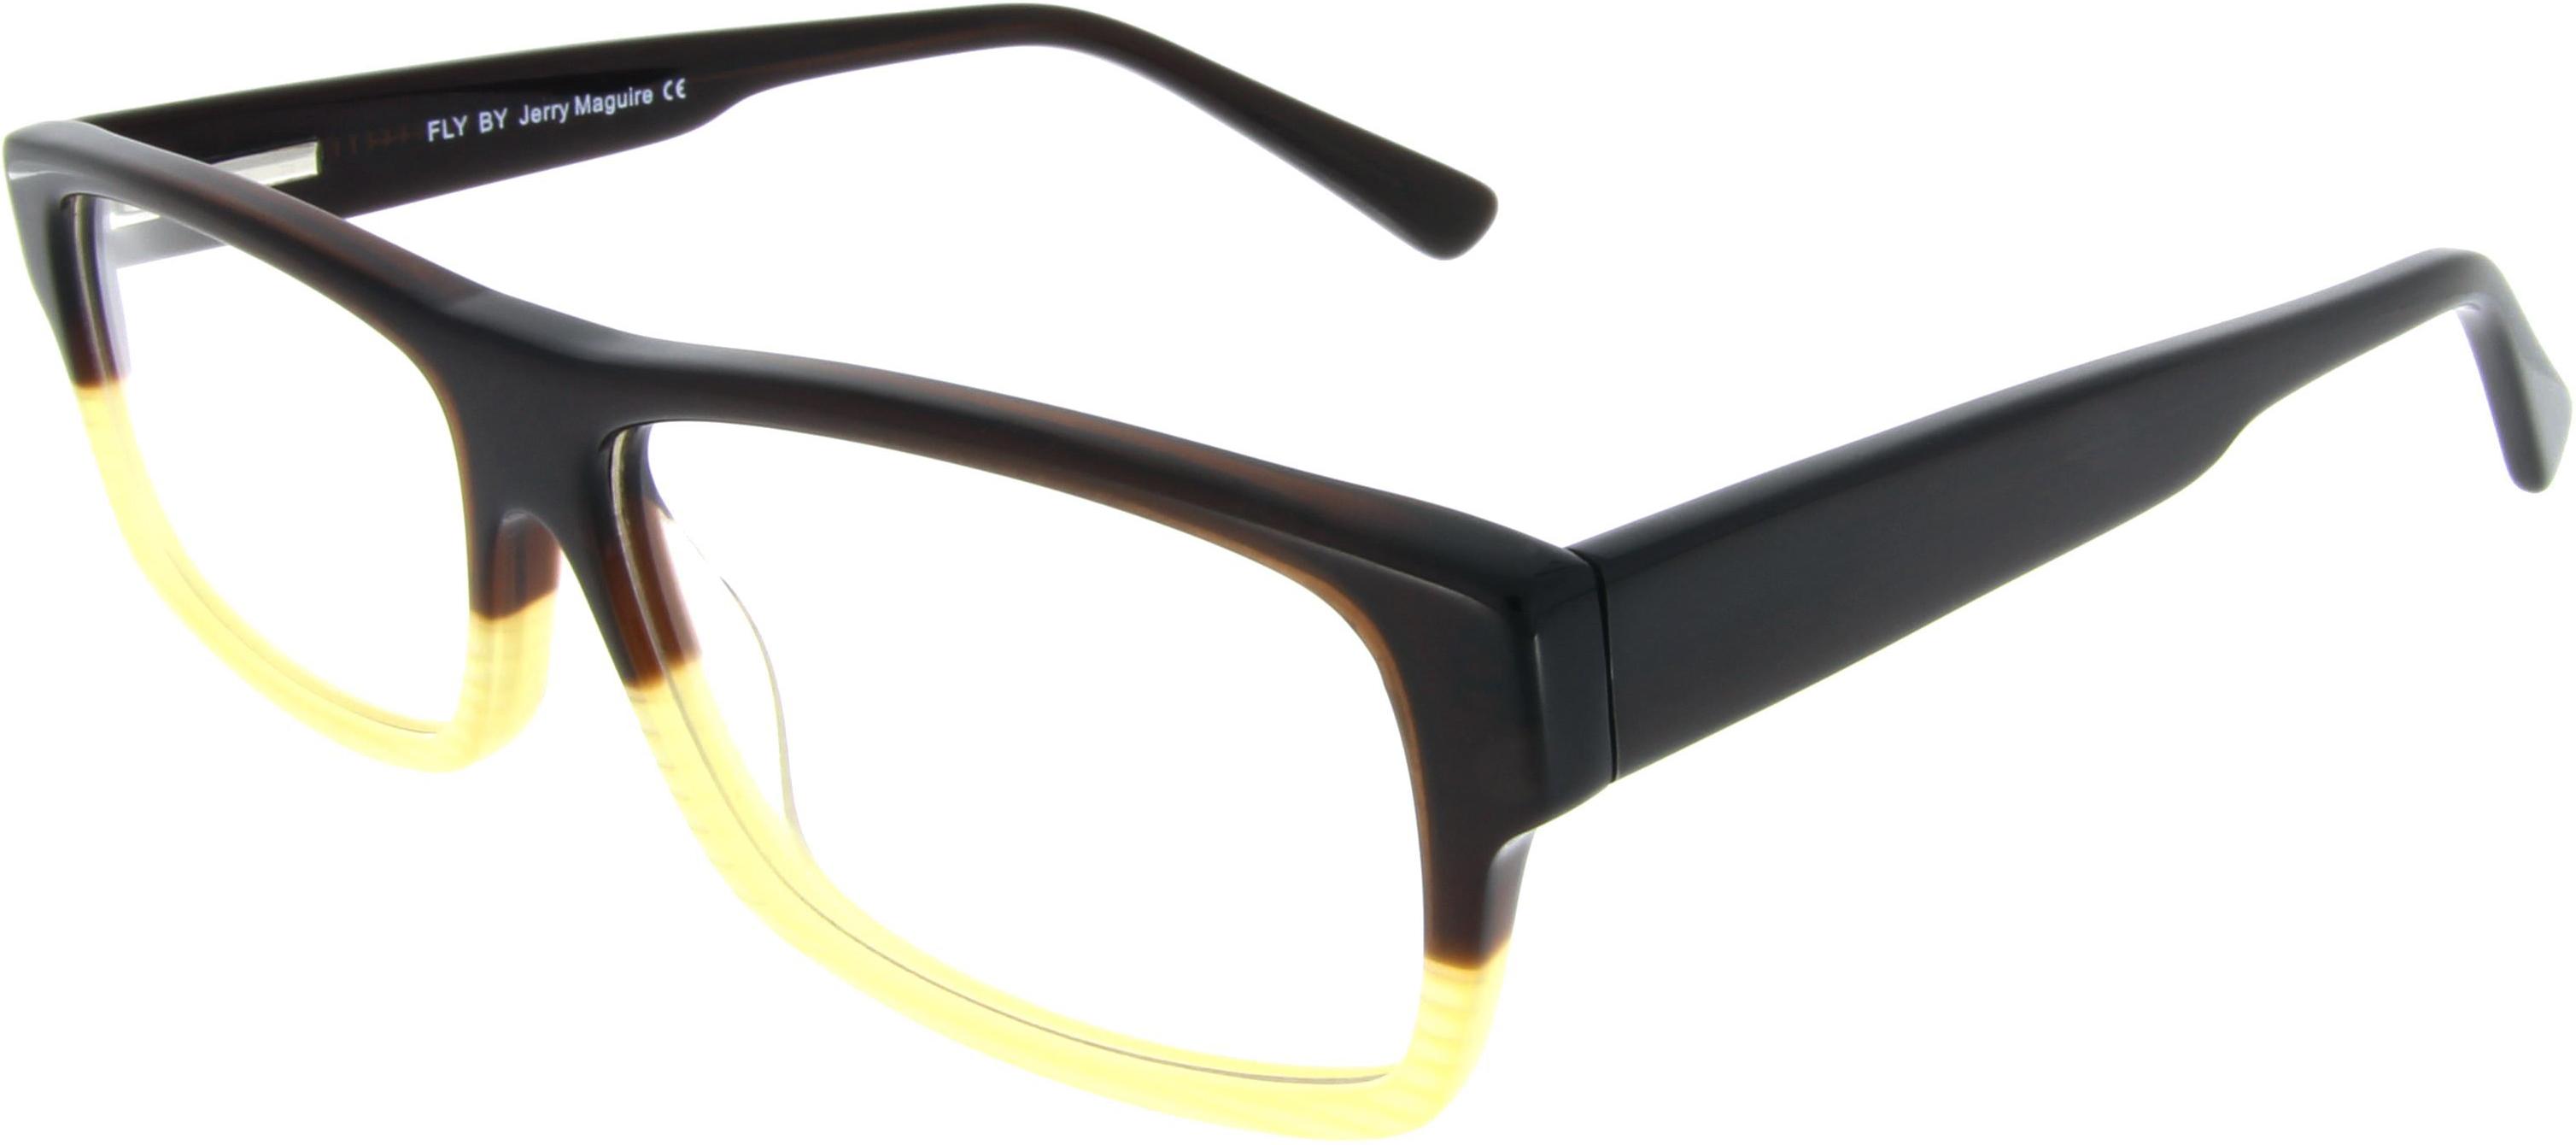 Kastenförmige Two-Tone Brille zum Top-Preis!